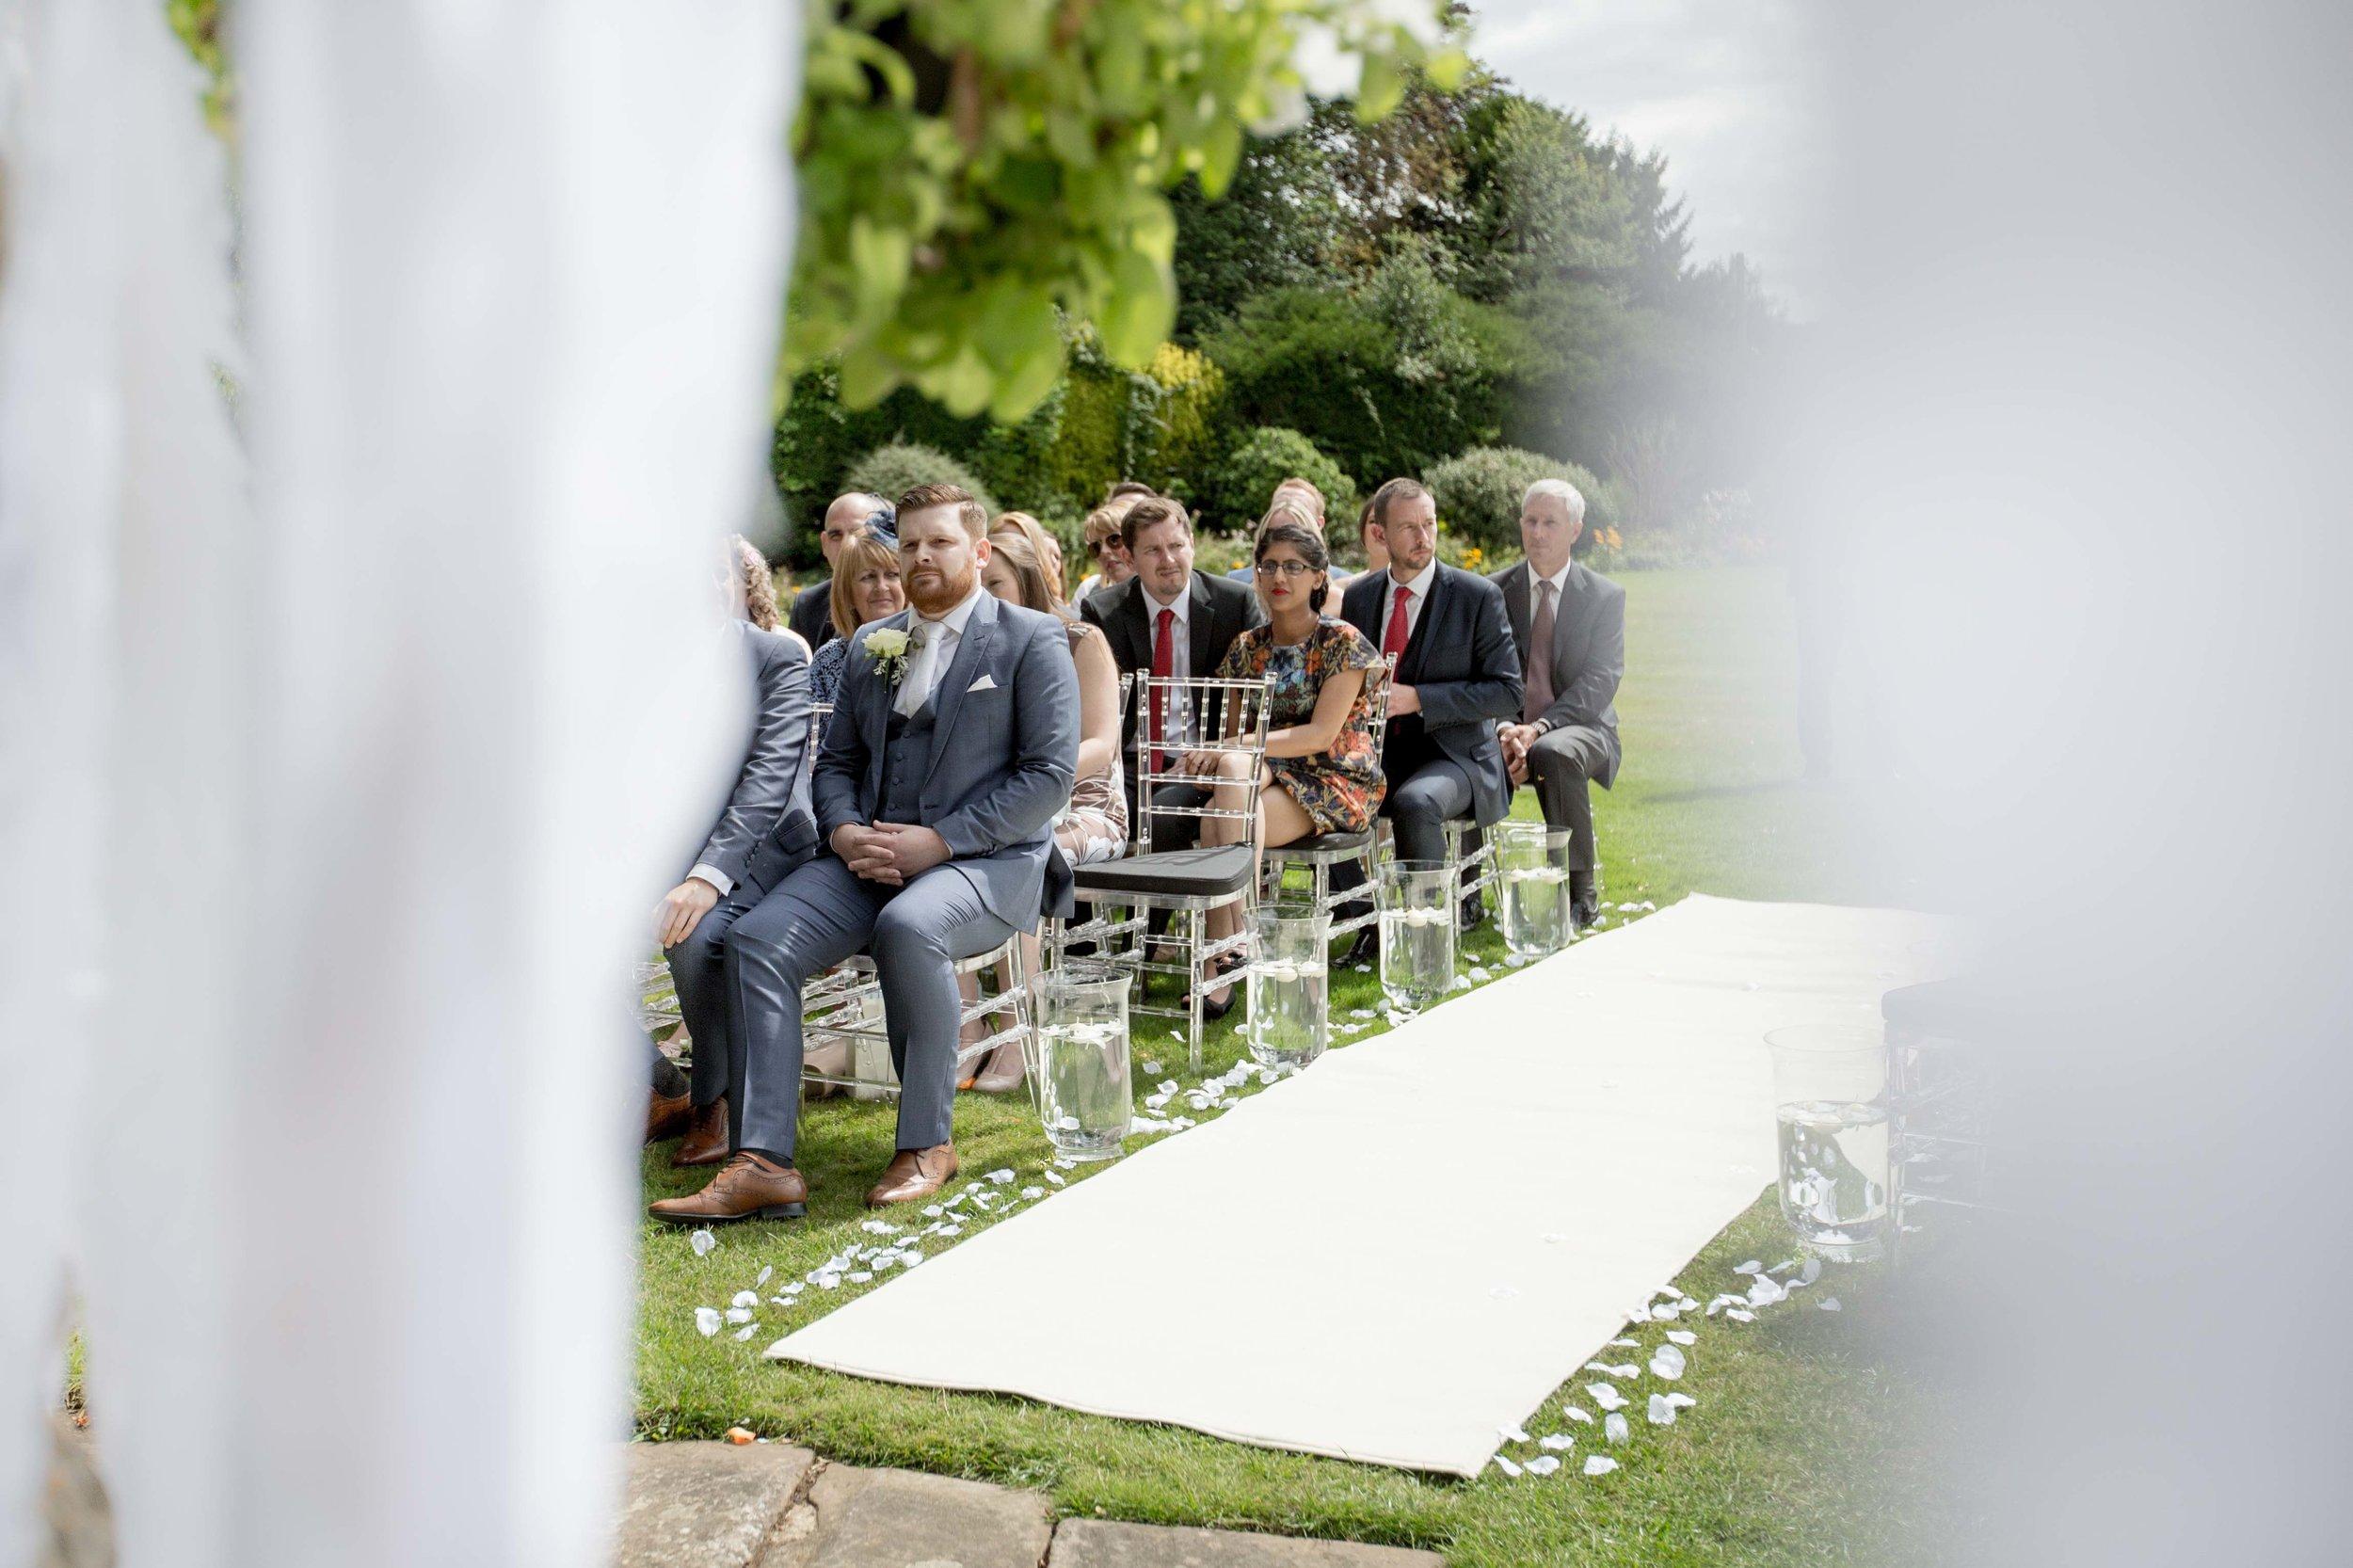 cotswold-wedding-photography-at-stonehouse-court-hotel-natalia-smith-photography-gloucestershire-wedding-photographer-28.jpg